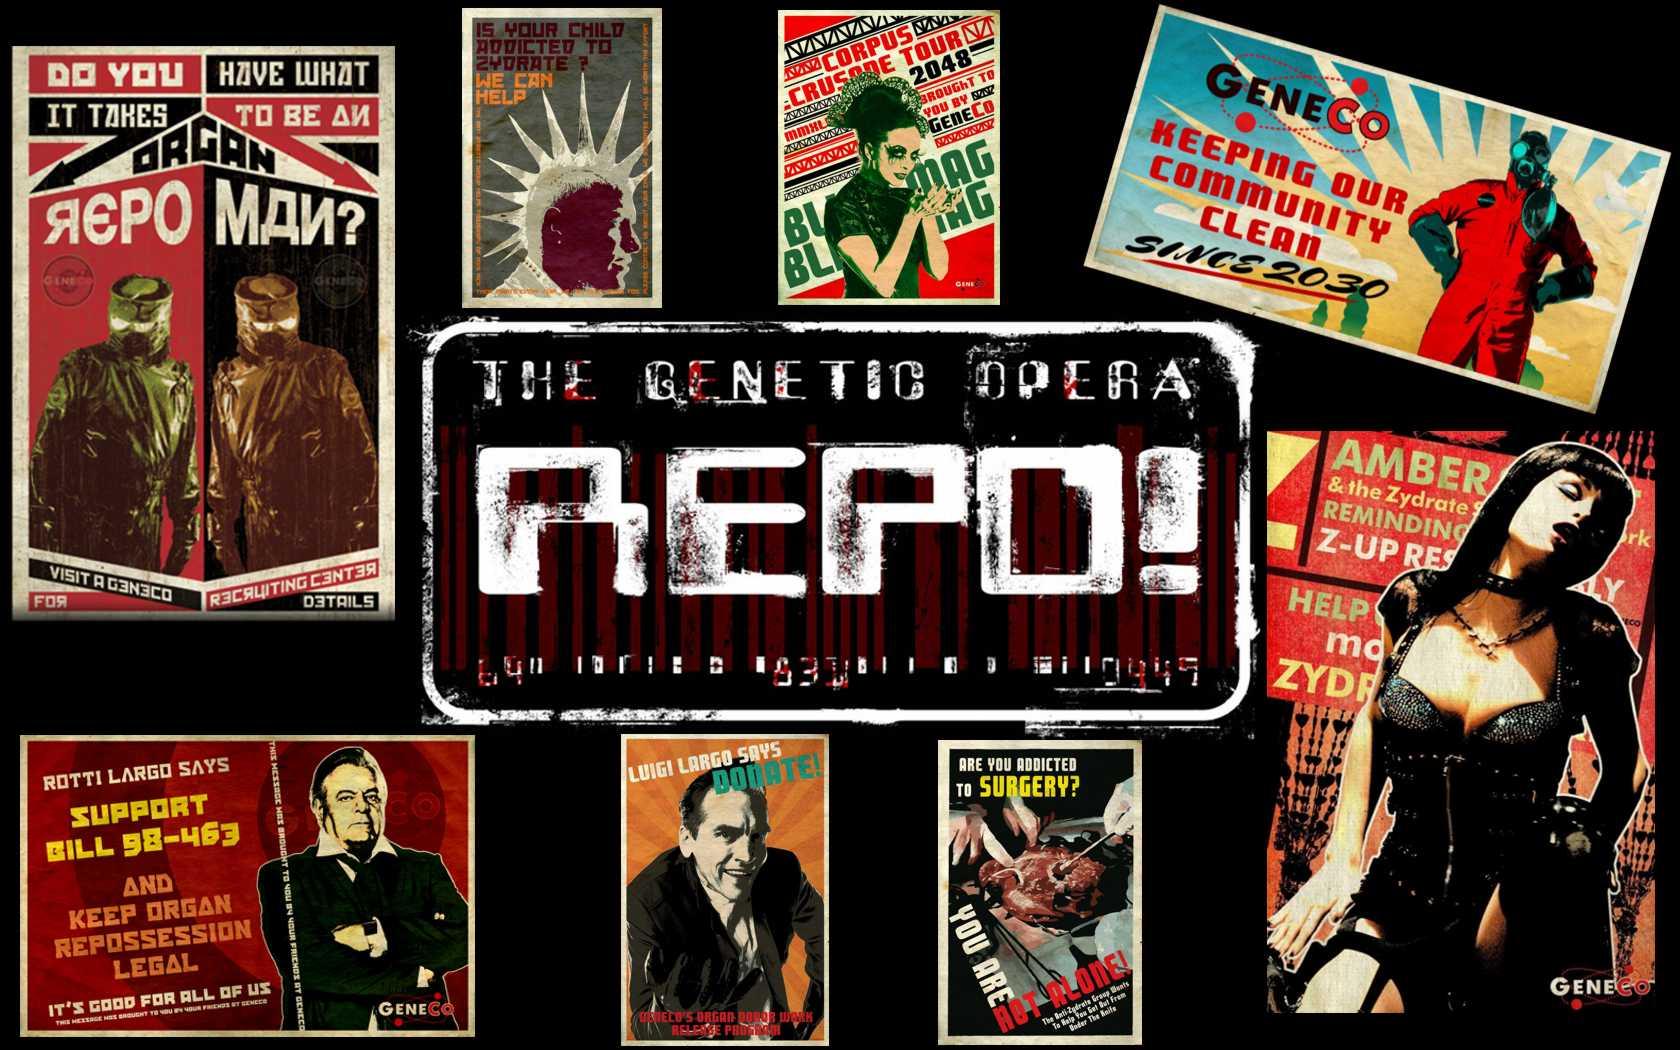 Repo the genetic opera wallpaper HQ WALLPAPER   178521 1680x1050